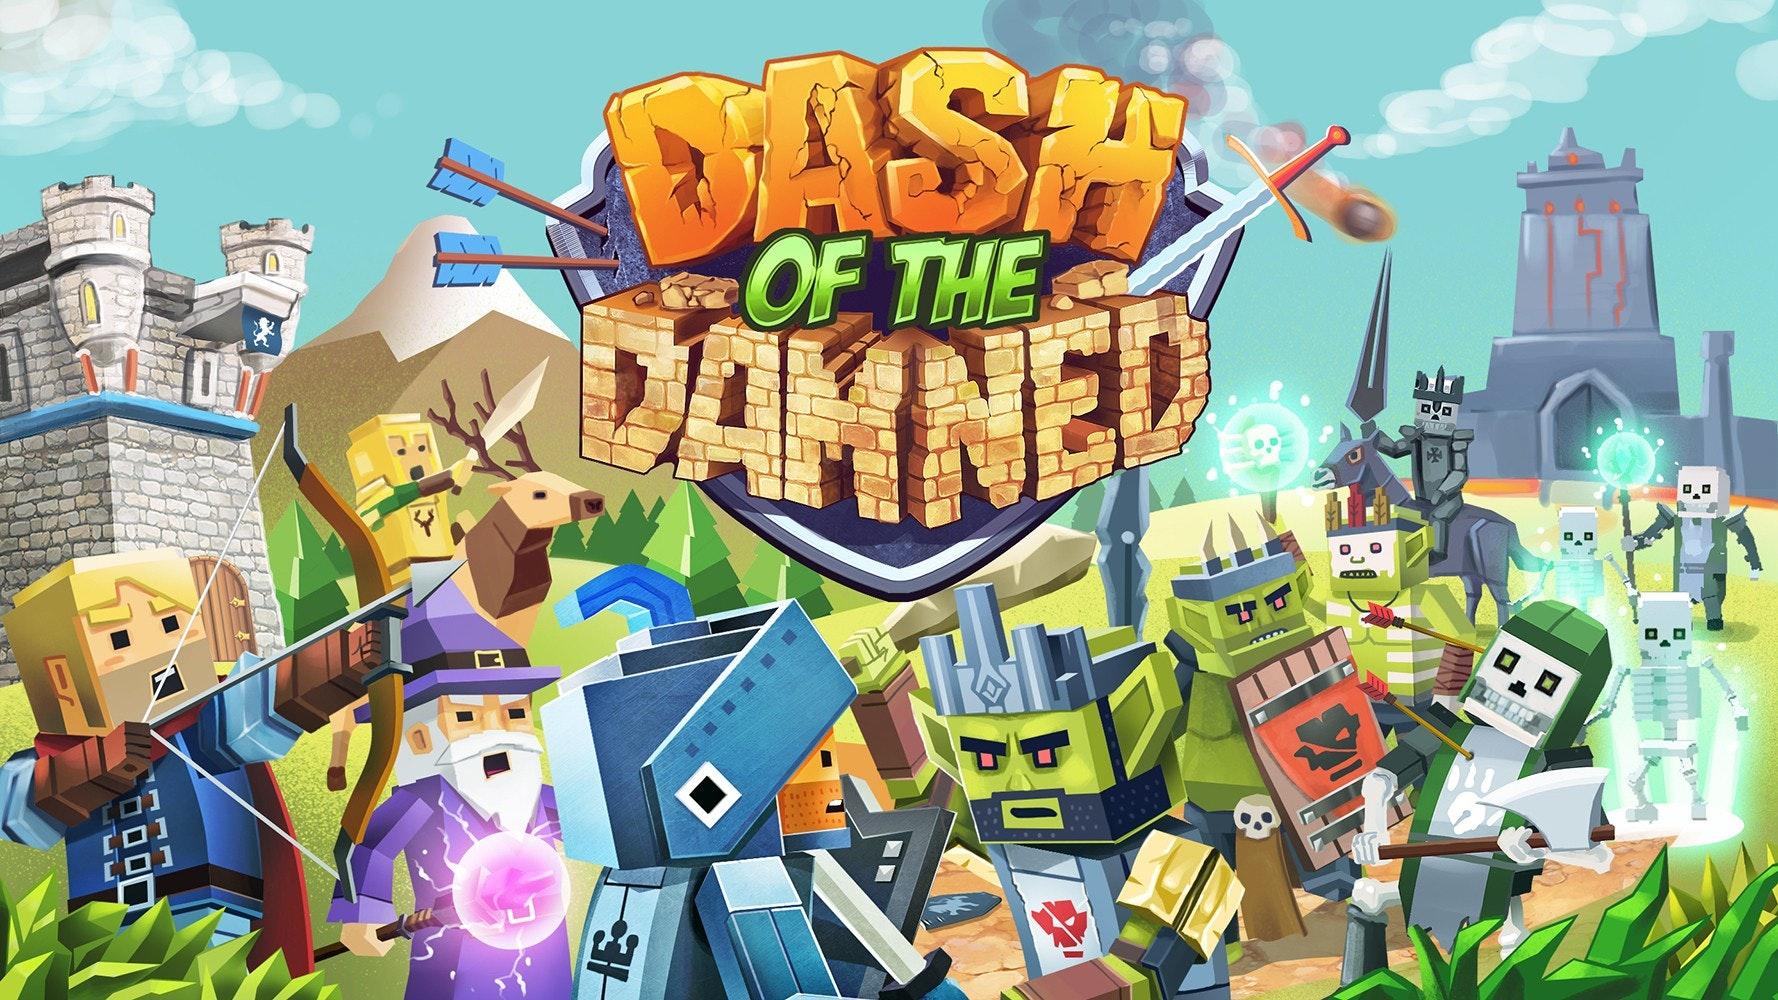 illustration for VR game, Dash of the Damned